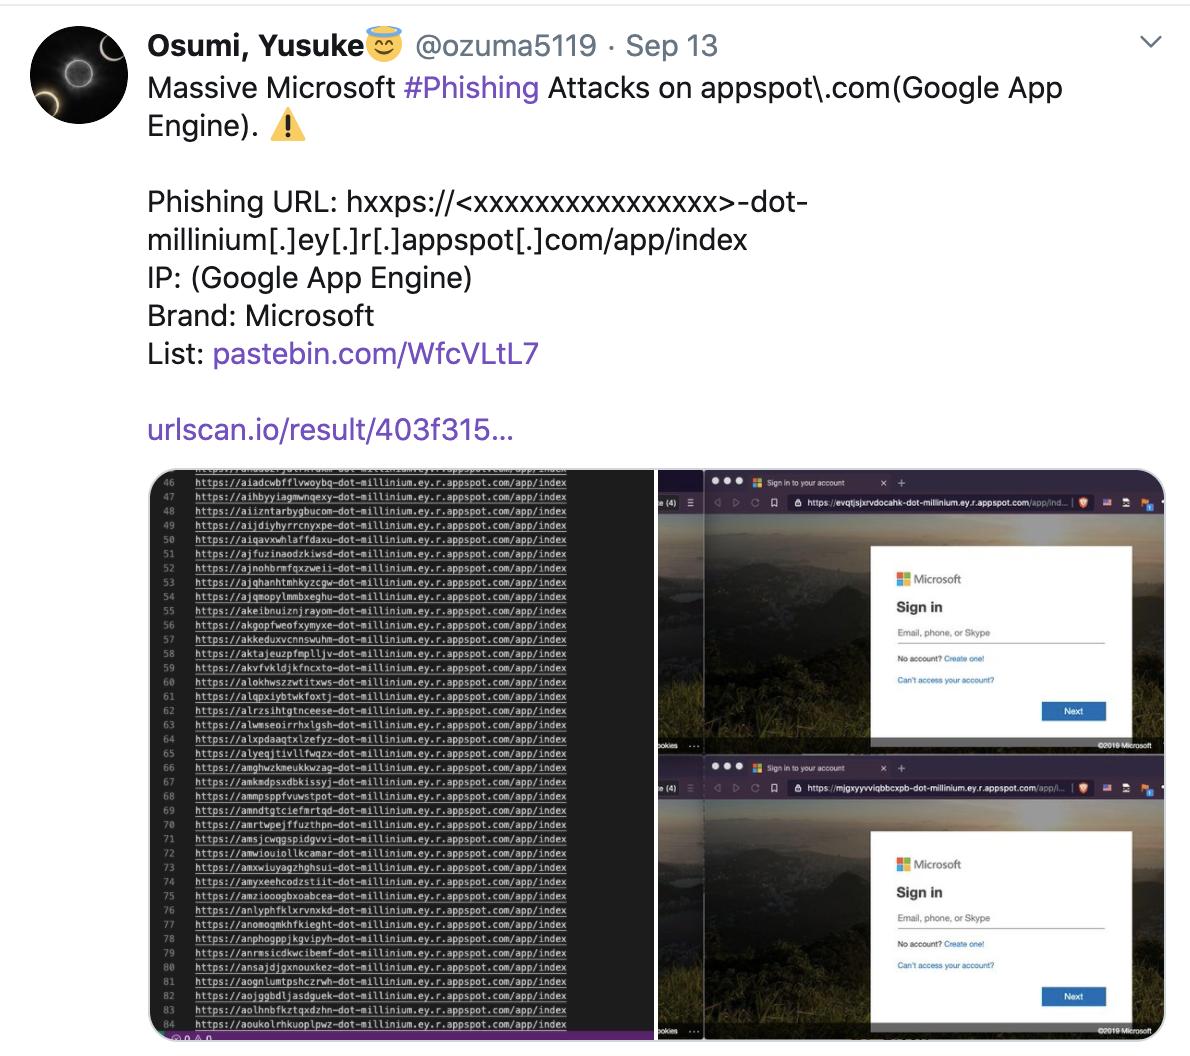 active exploitation google app engine phishing